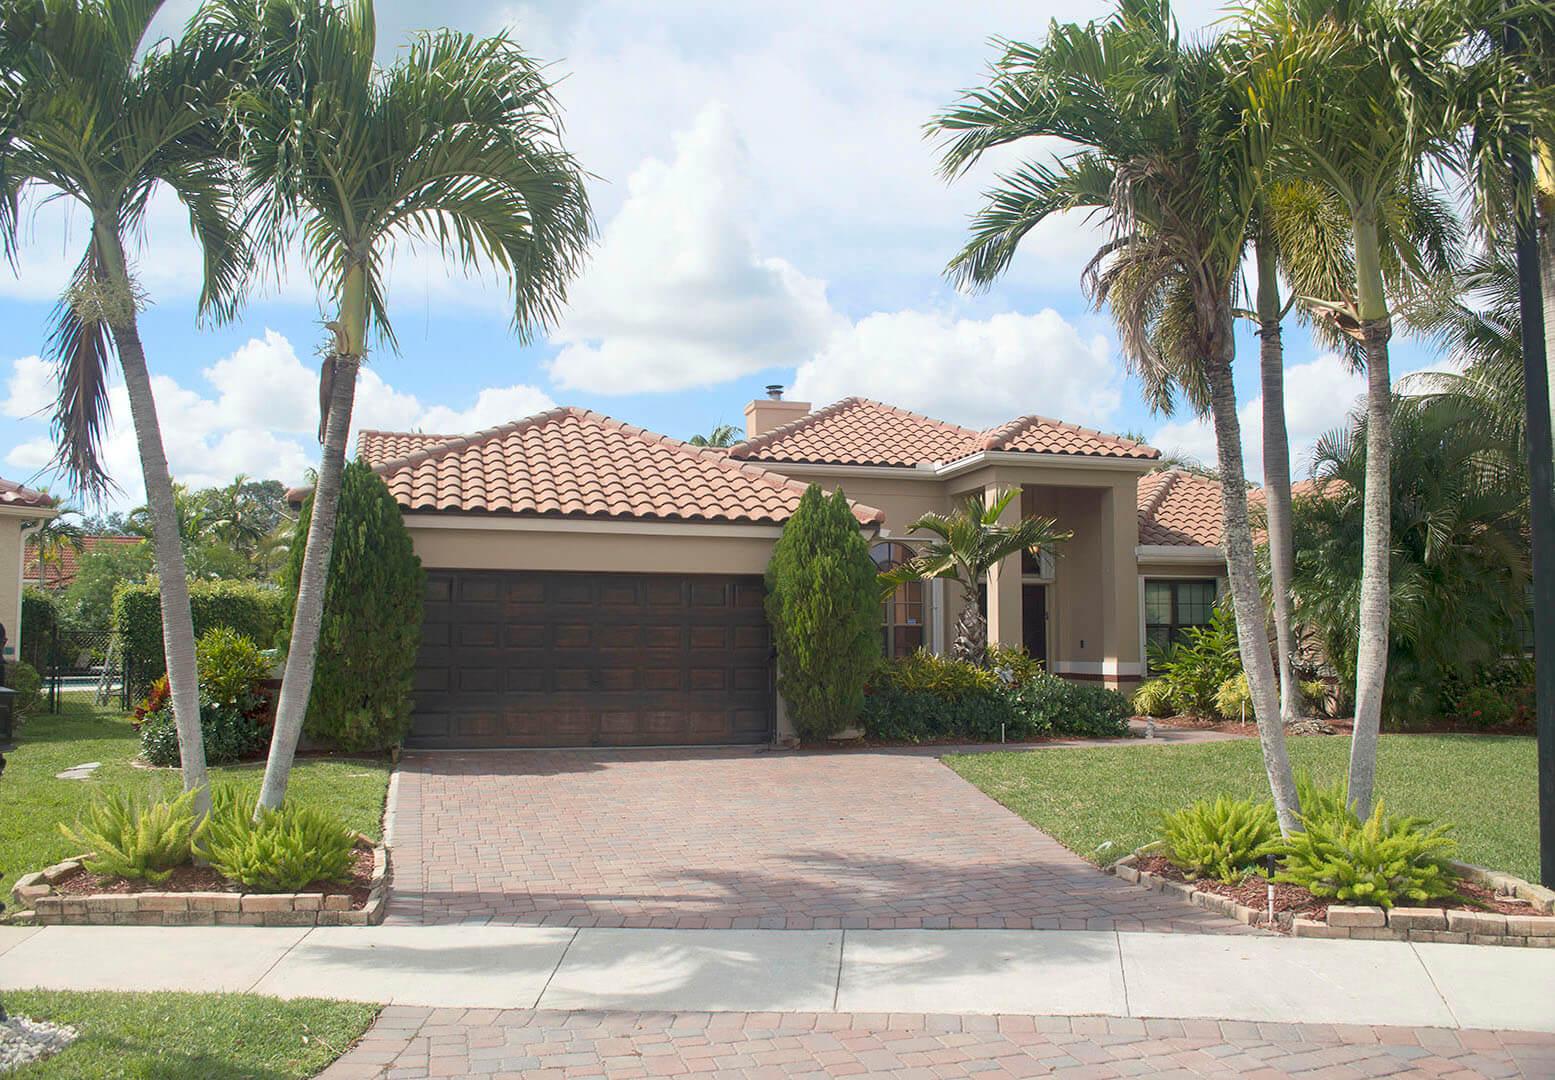 9651-Ridgeside-Ct-Davie-FL-1-House-Front